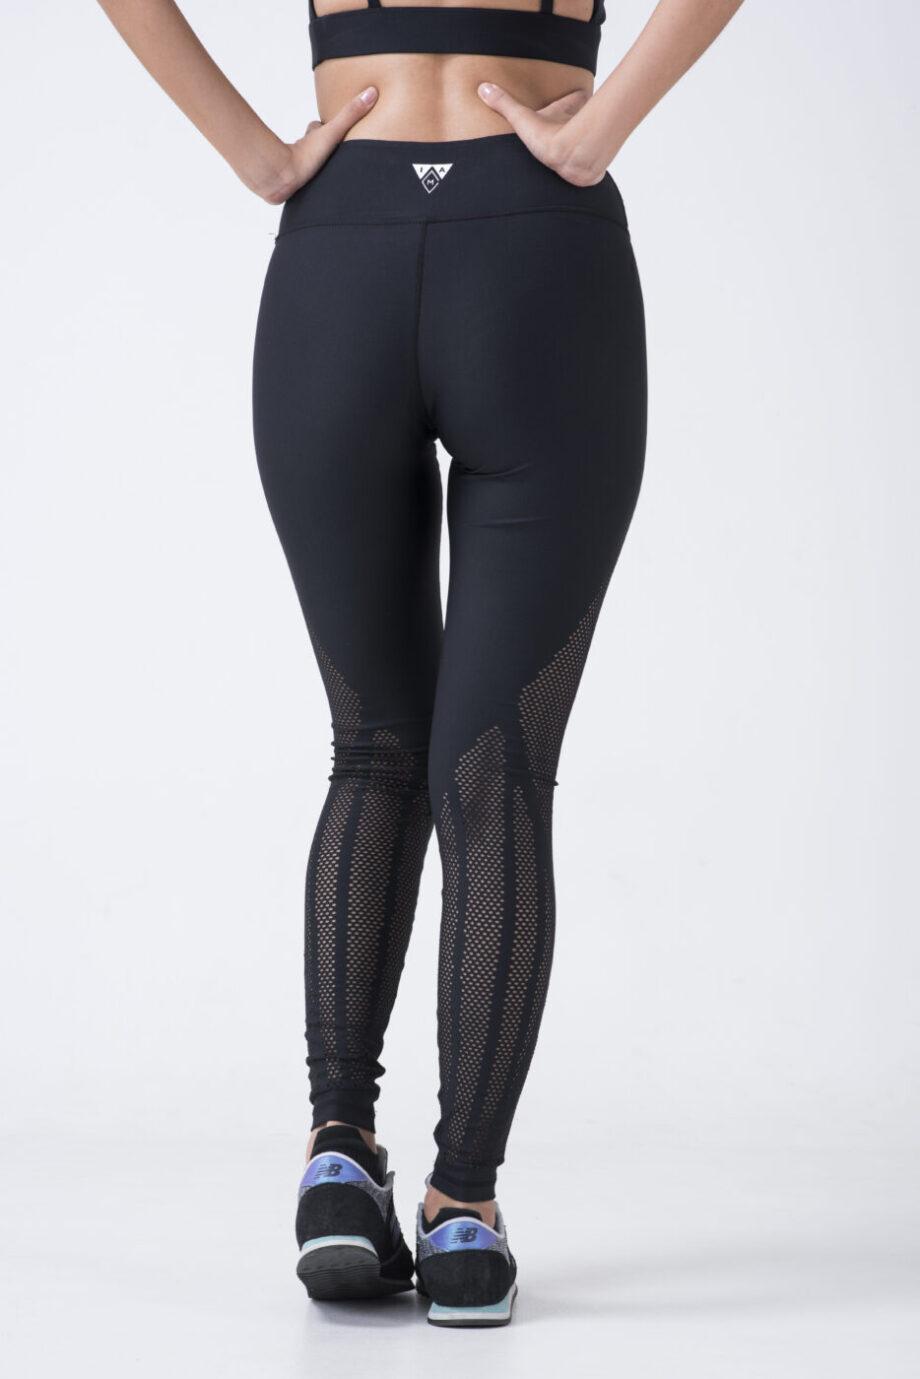 woman in black leggings